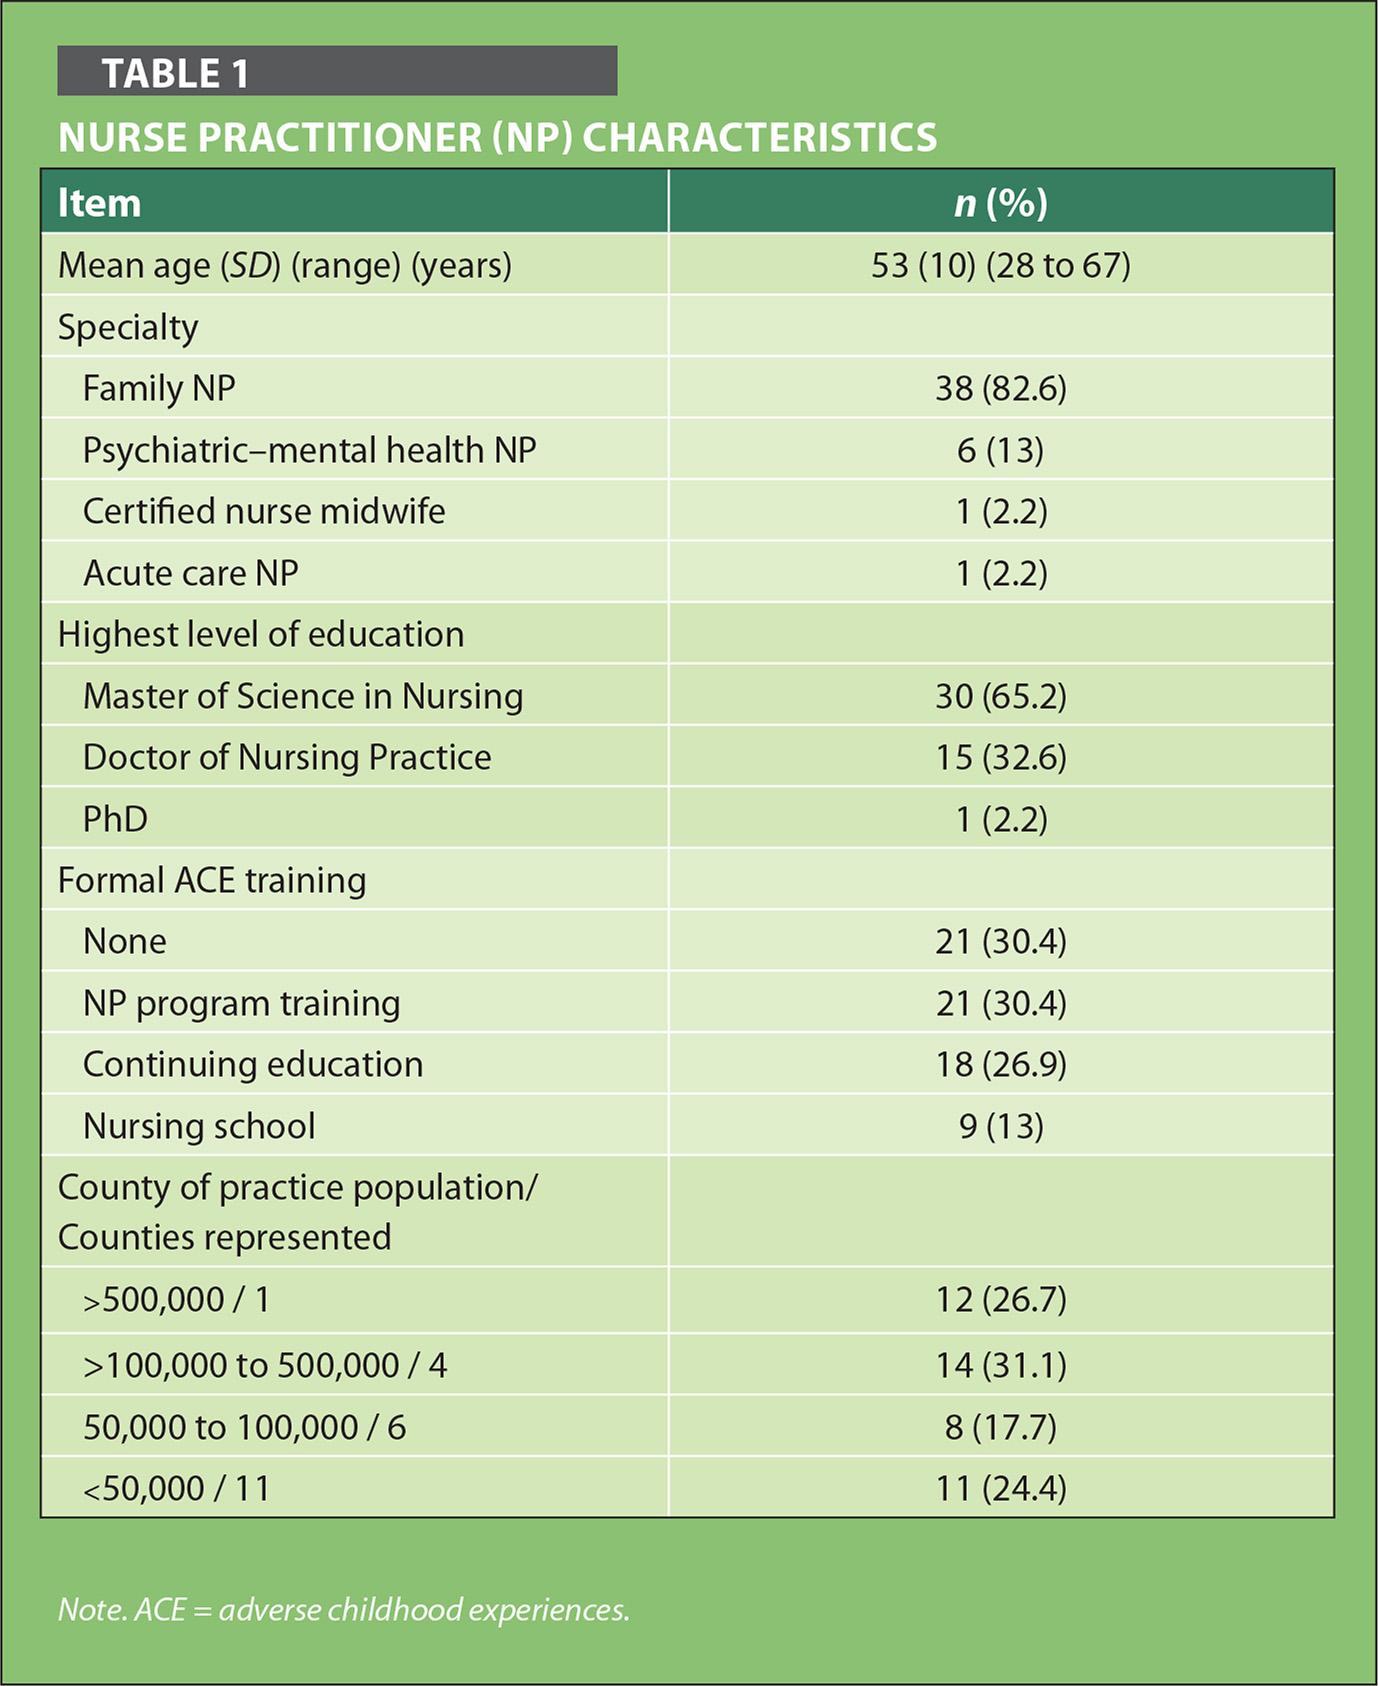 Nurse Practitioner (NP) Characteristics